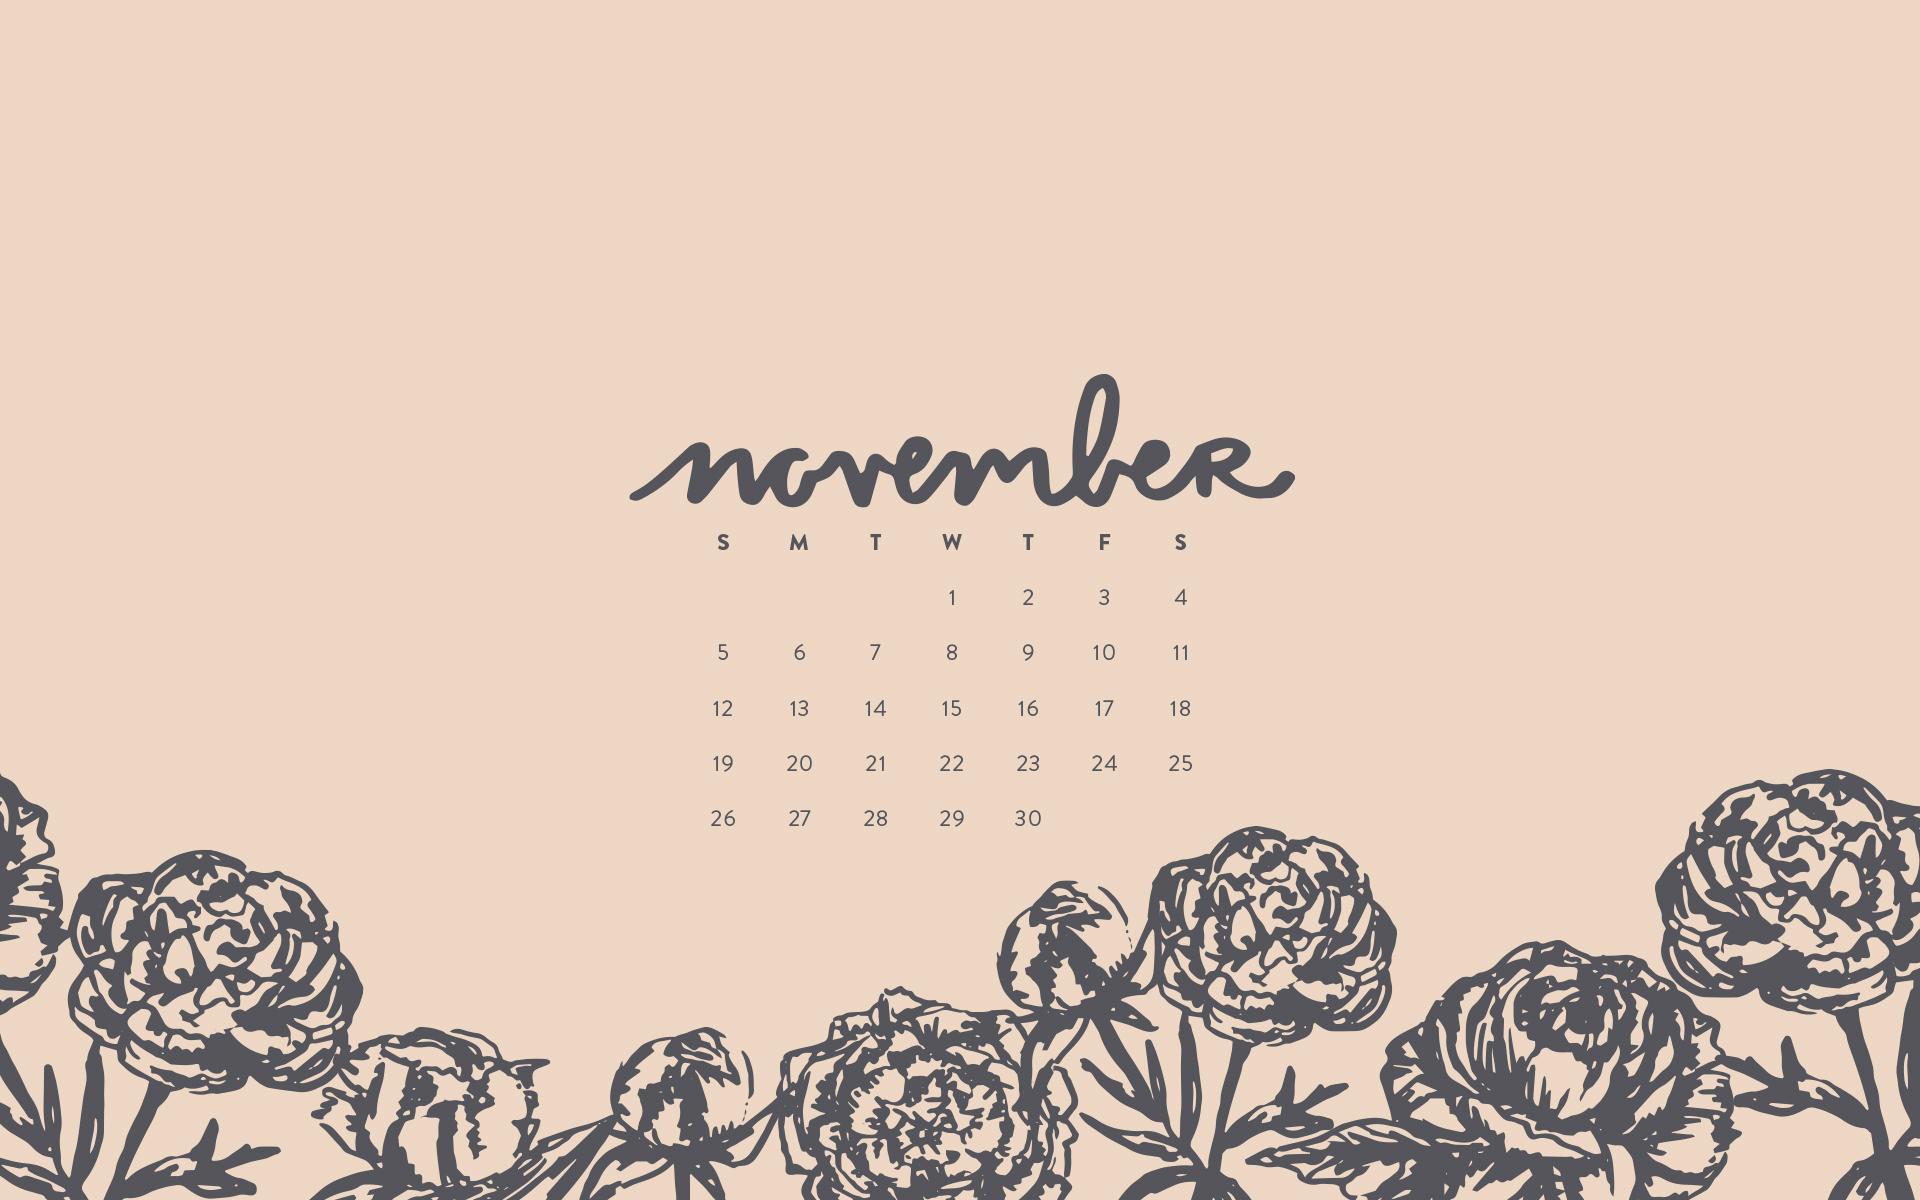 SOA Wallpaper 2017 November